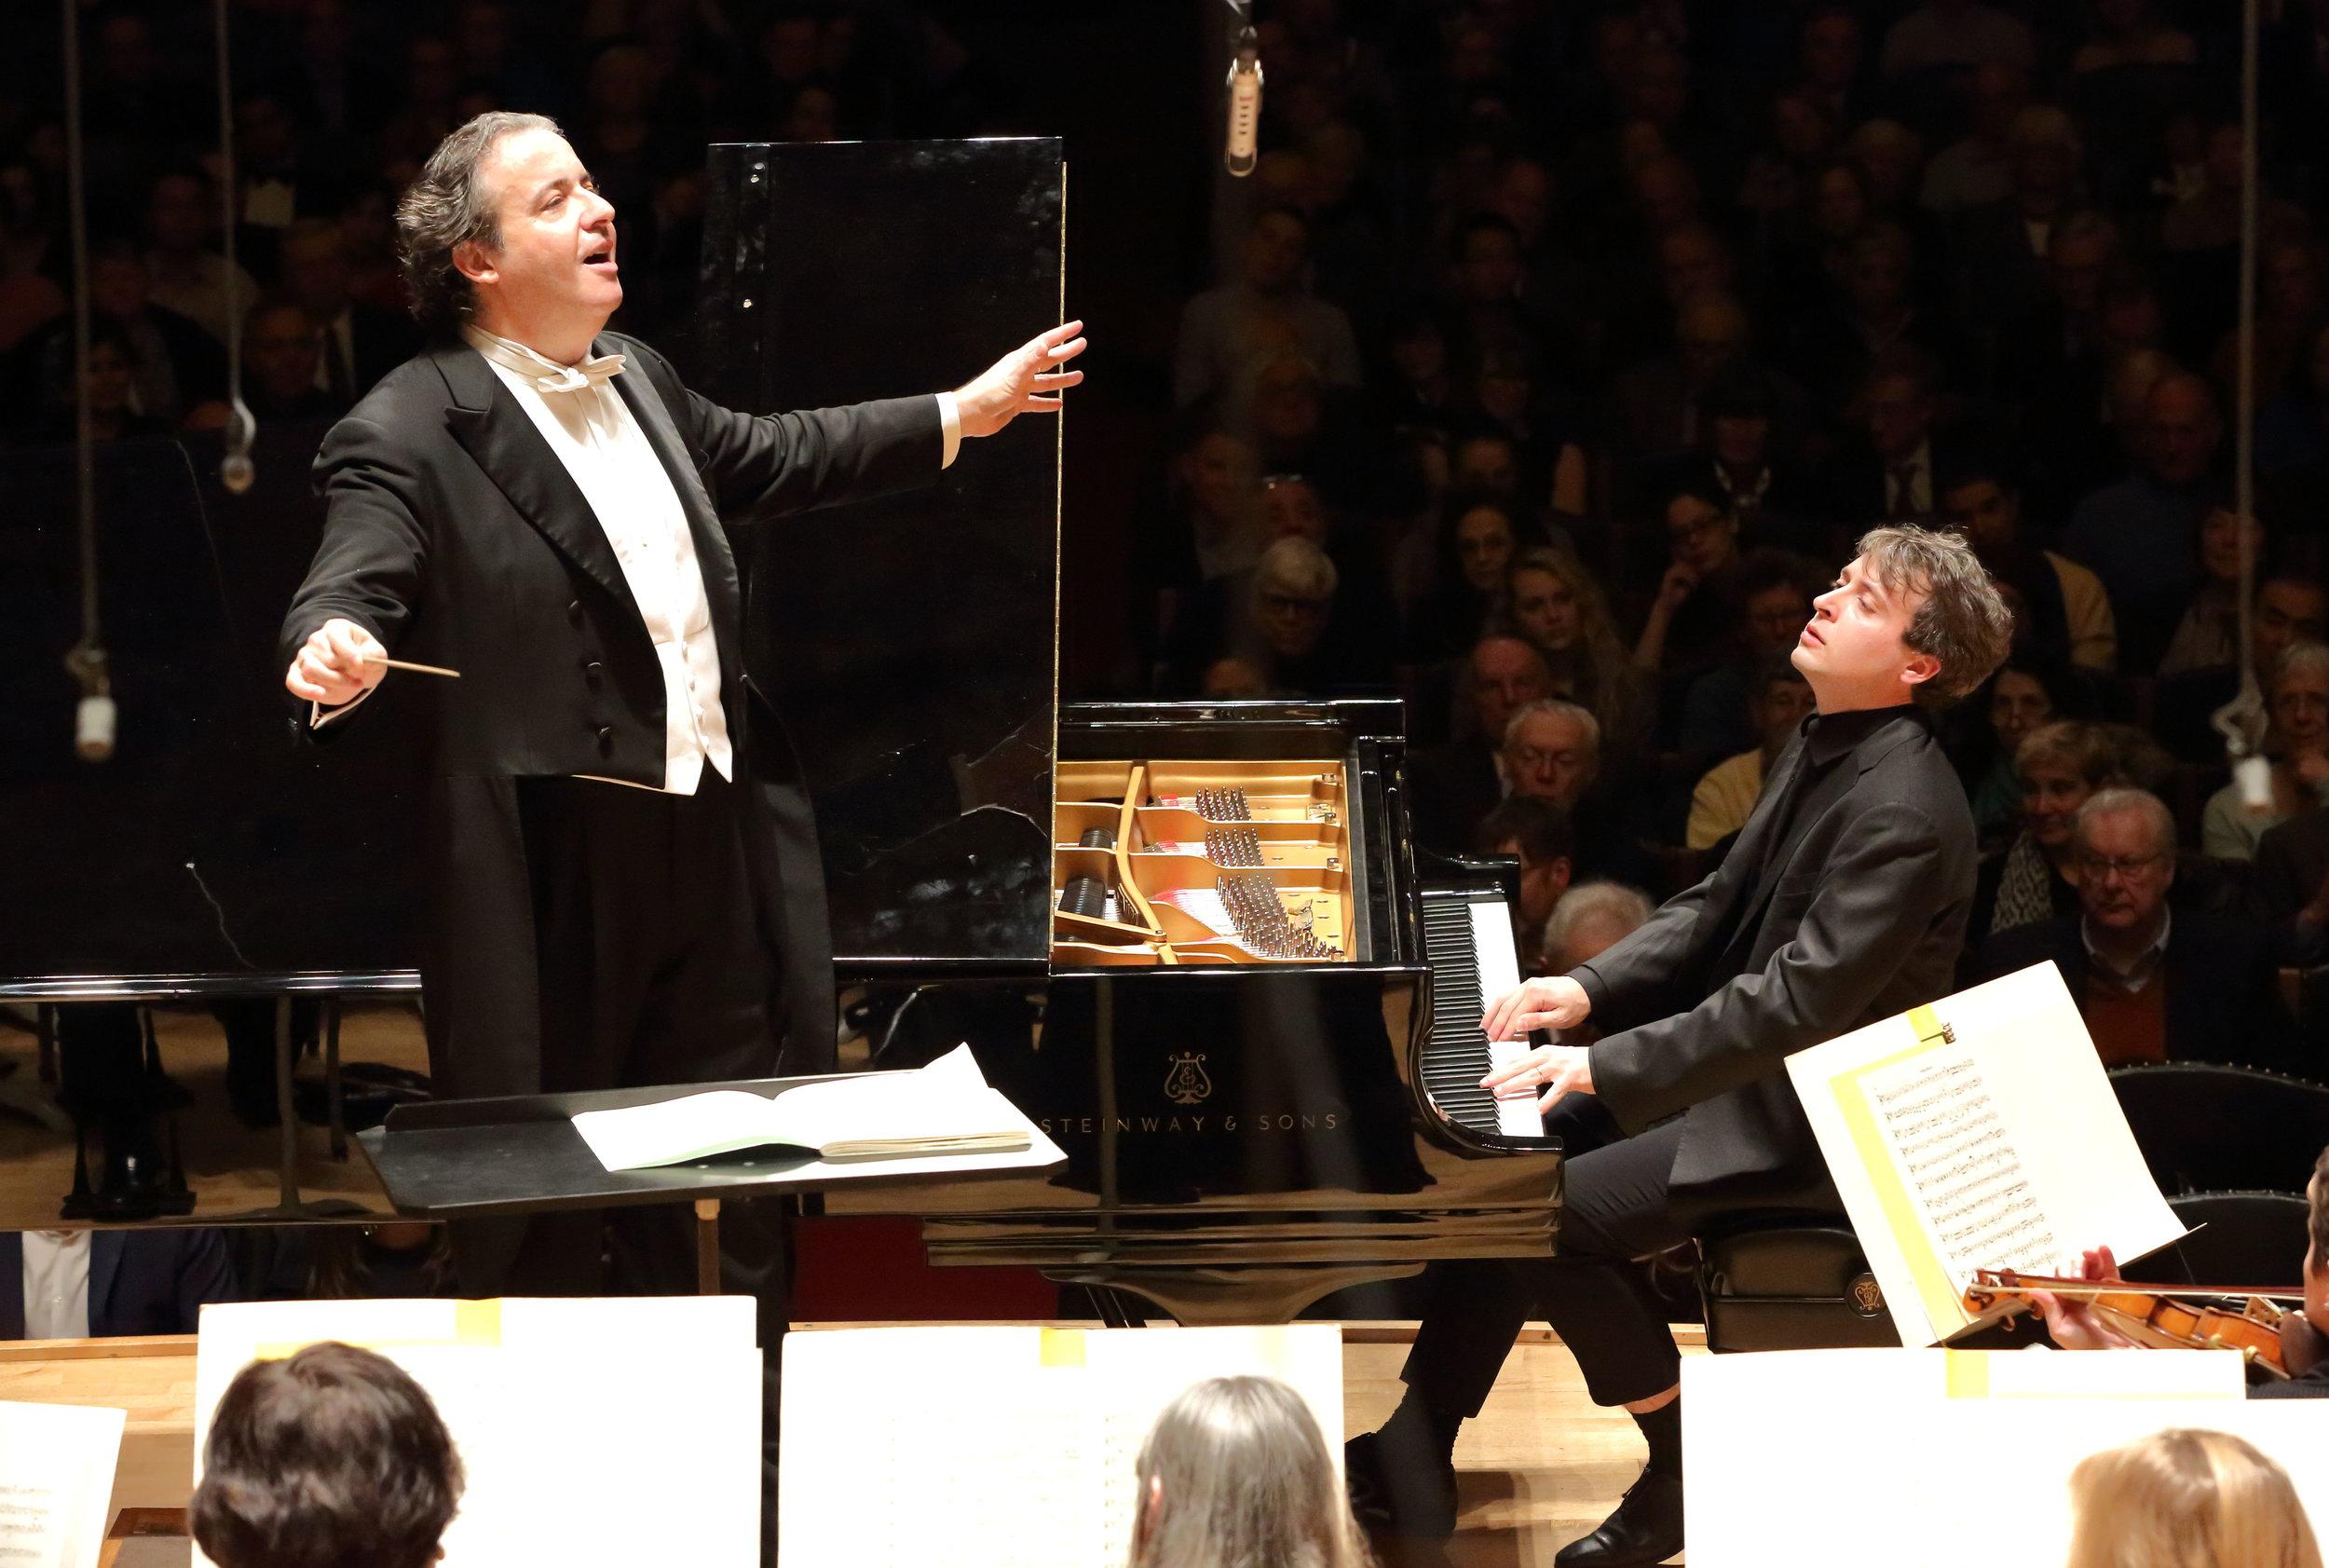 Juanjo Mena conducts the Boston Symphony Orchestra with pianist Jean-Frédéric Neuburger, Thursday, Jan. 26 at Symphony Hall. Hilary Scott photograph.